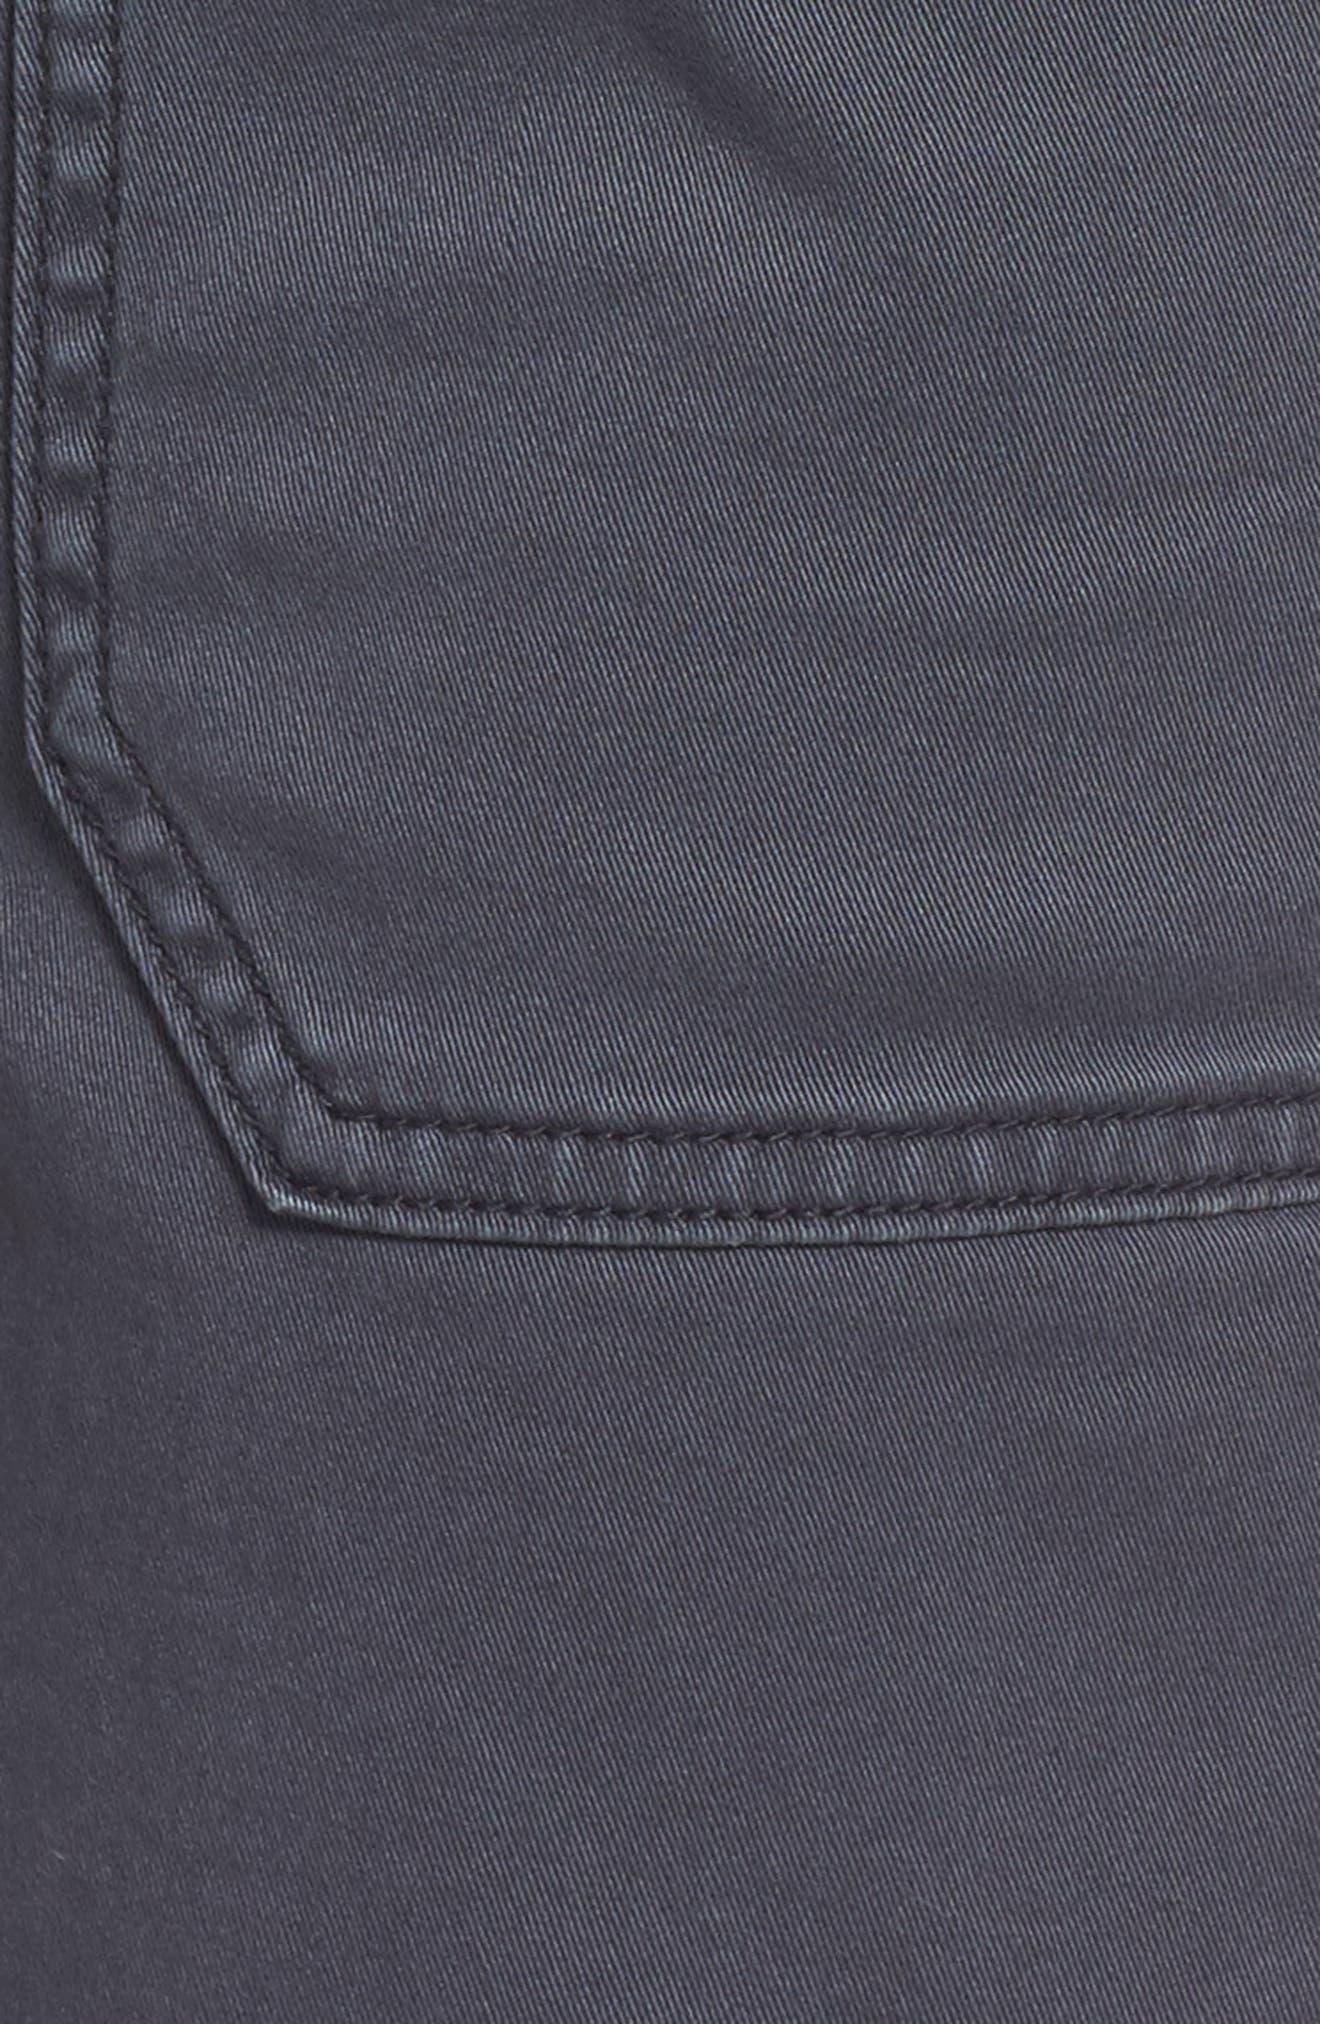 Utility Shorts,                             Alternate thumbnail 27, color,